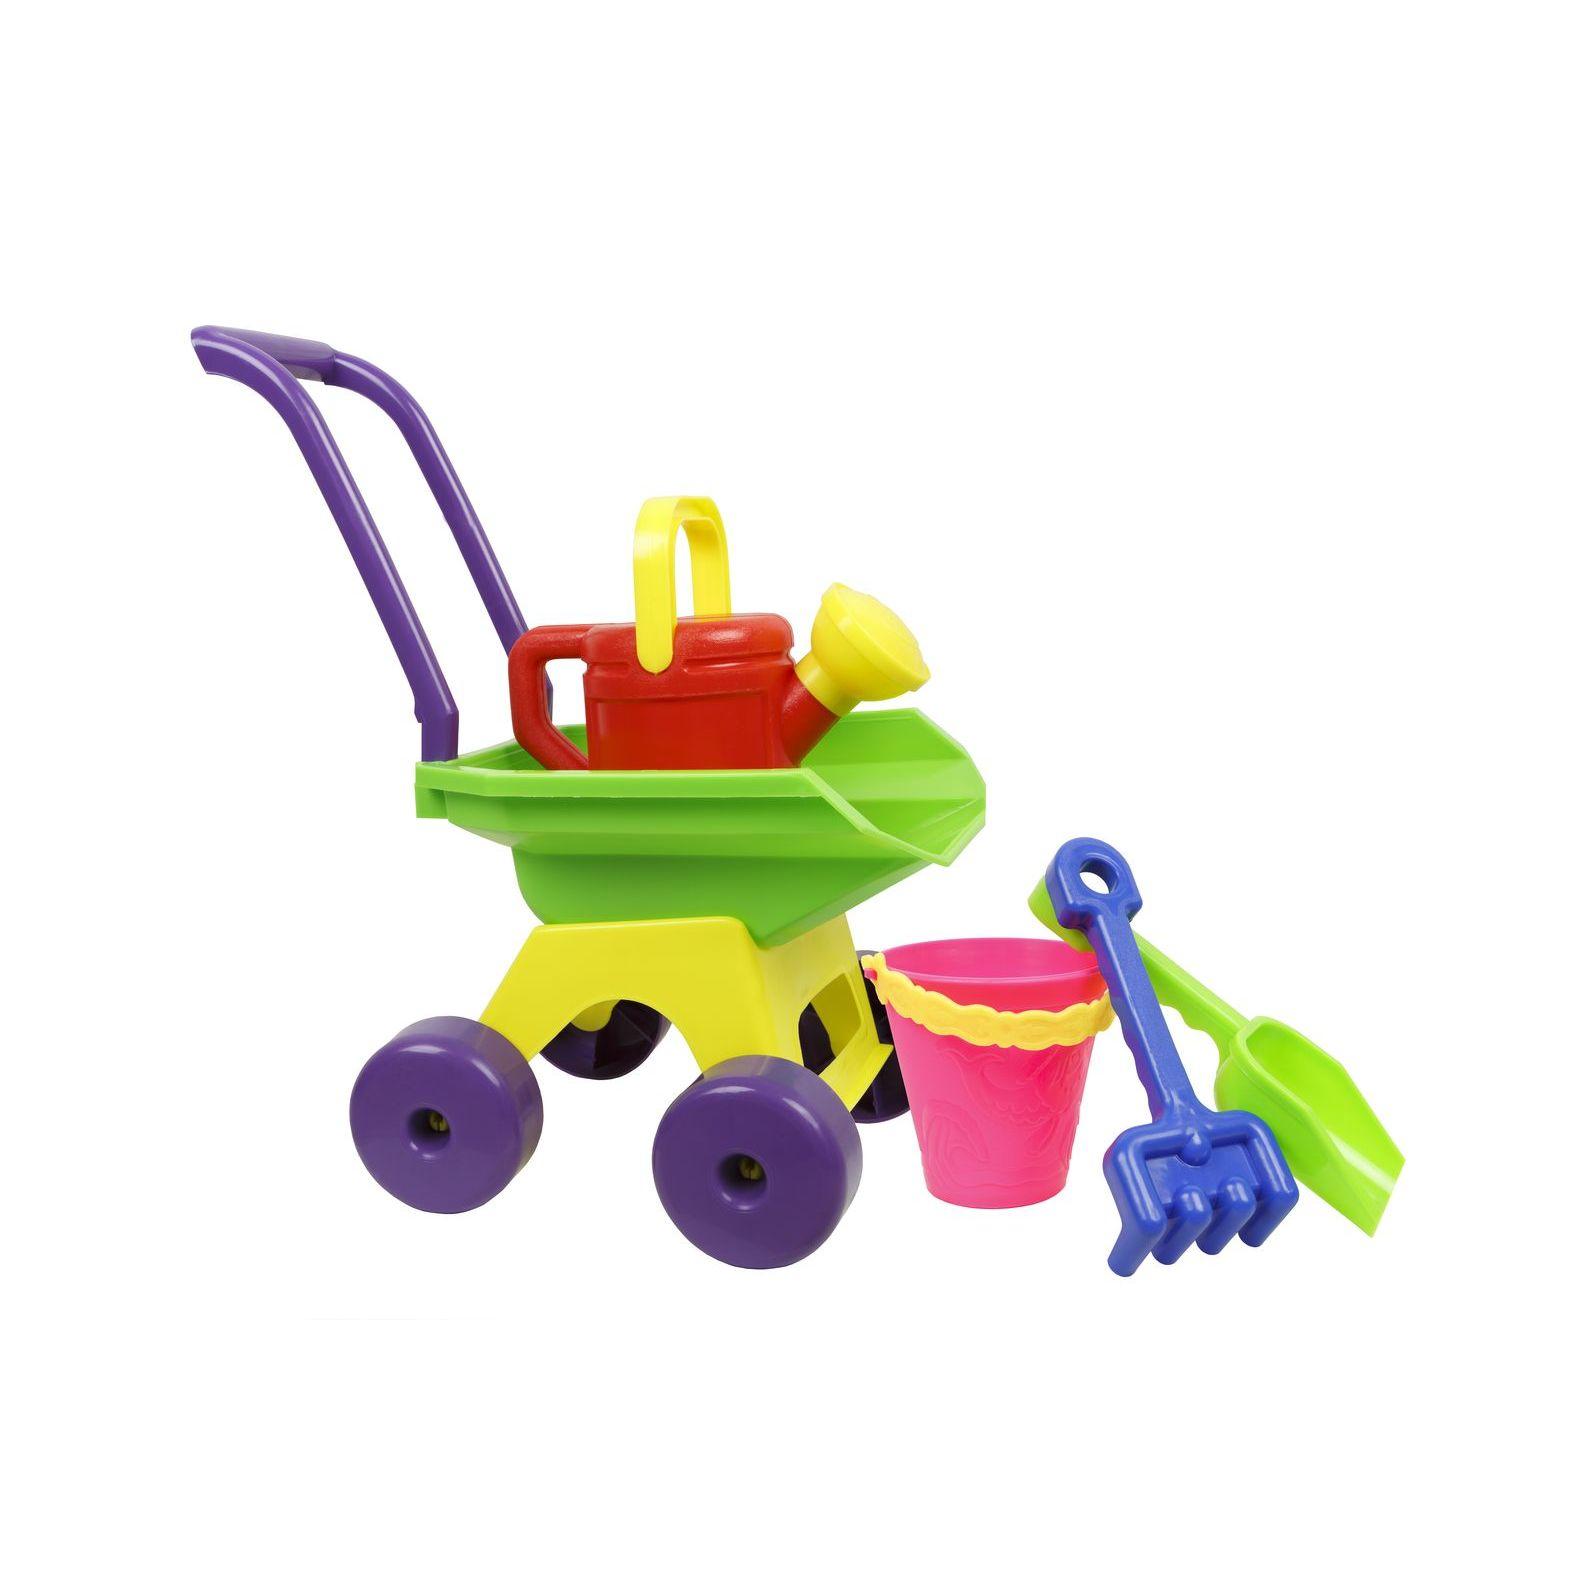 Juguetes de playa/arena OGONEK conjunto de verano #6 juguetes para niños Juego caja de arena de playa juguetes de arena